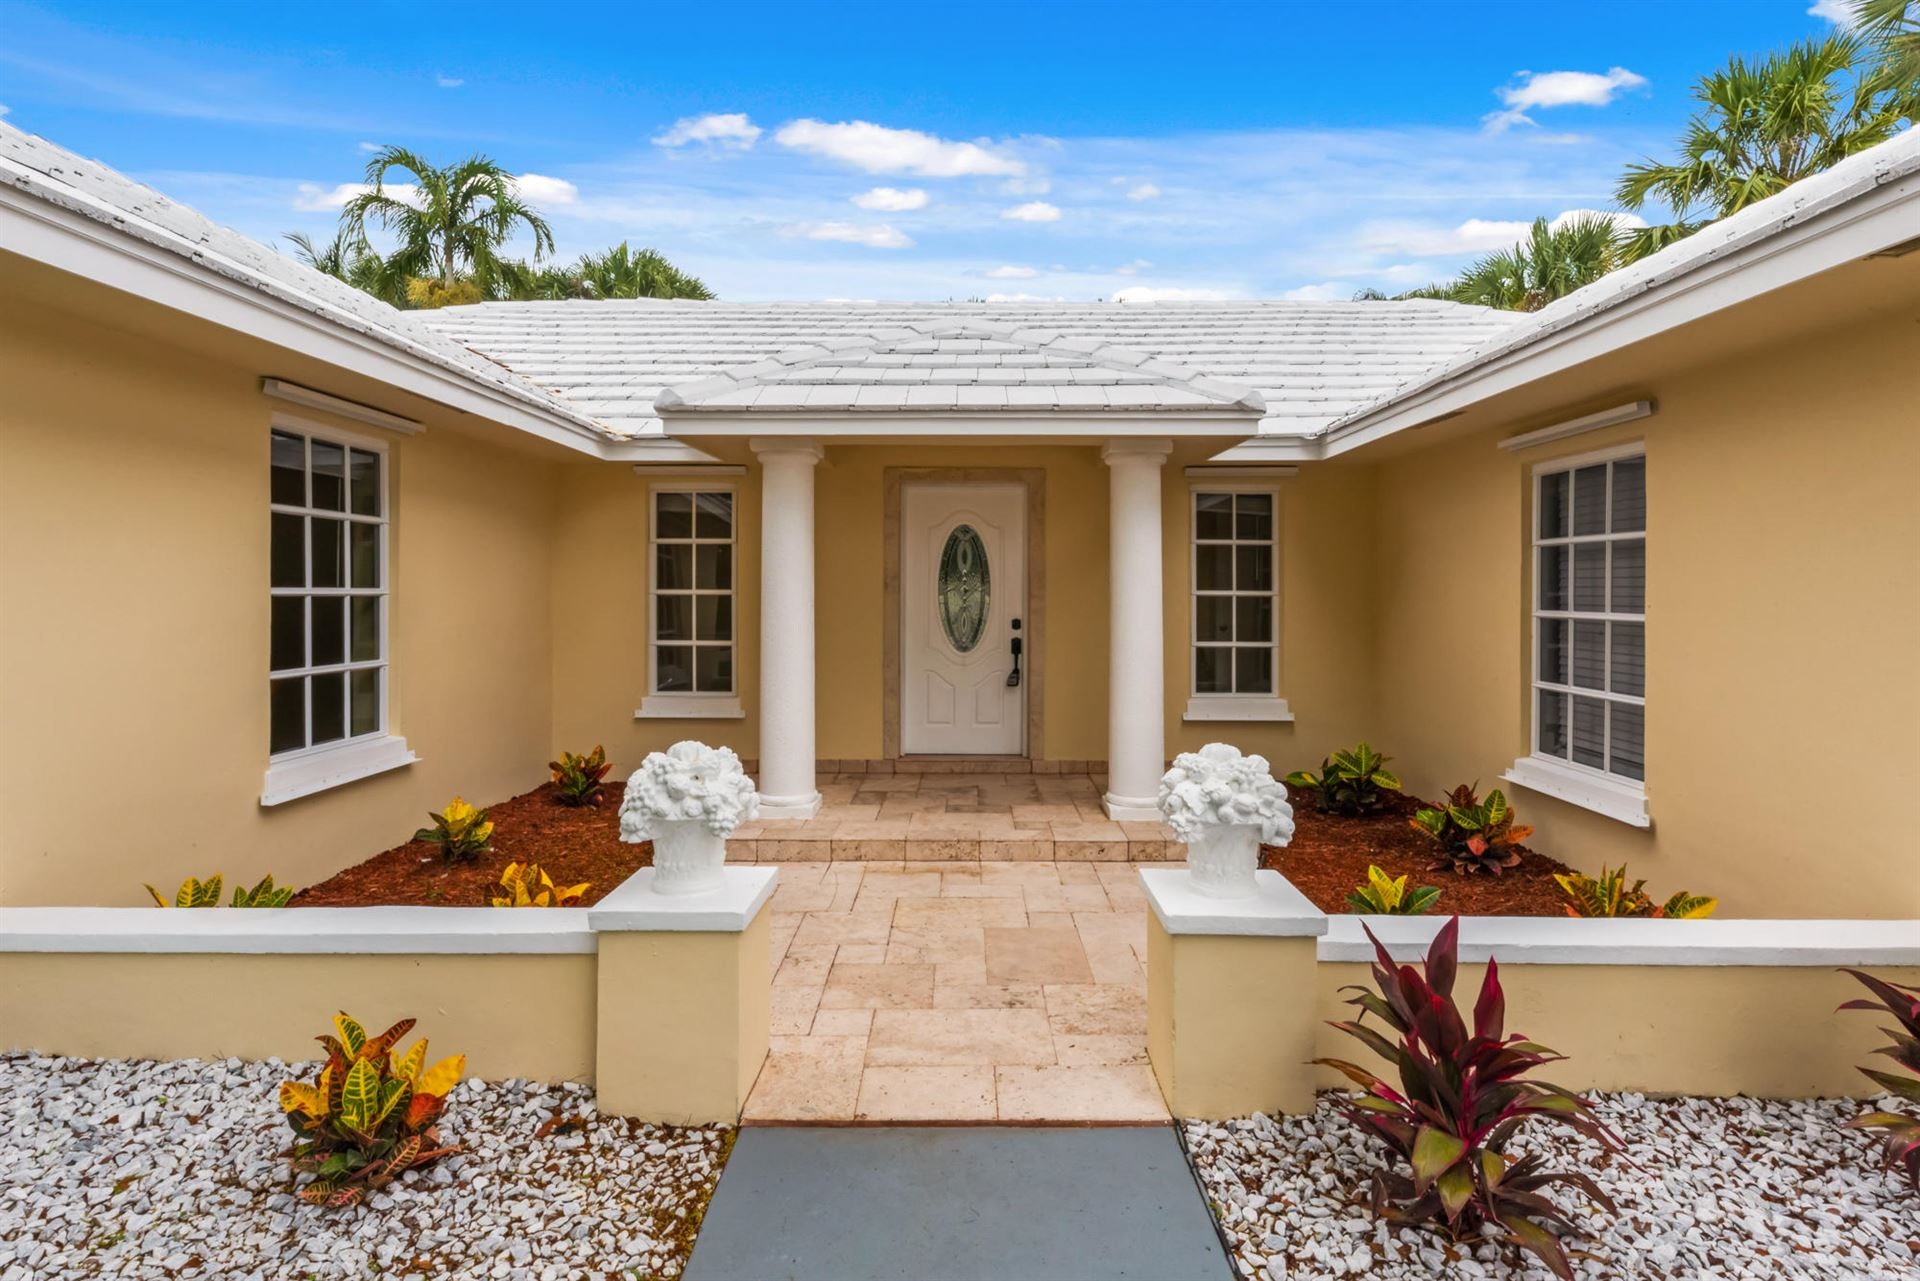 12835 S Normandy Way, Palm Beach Gardens, FL 33410 - MLS#: RX-10730758